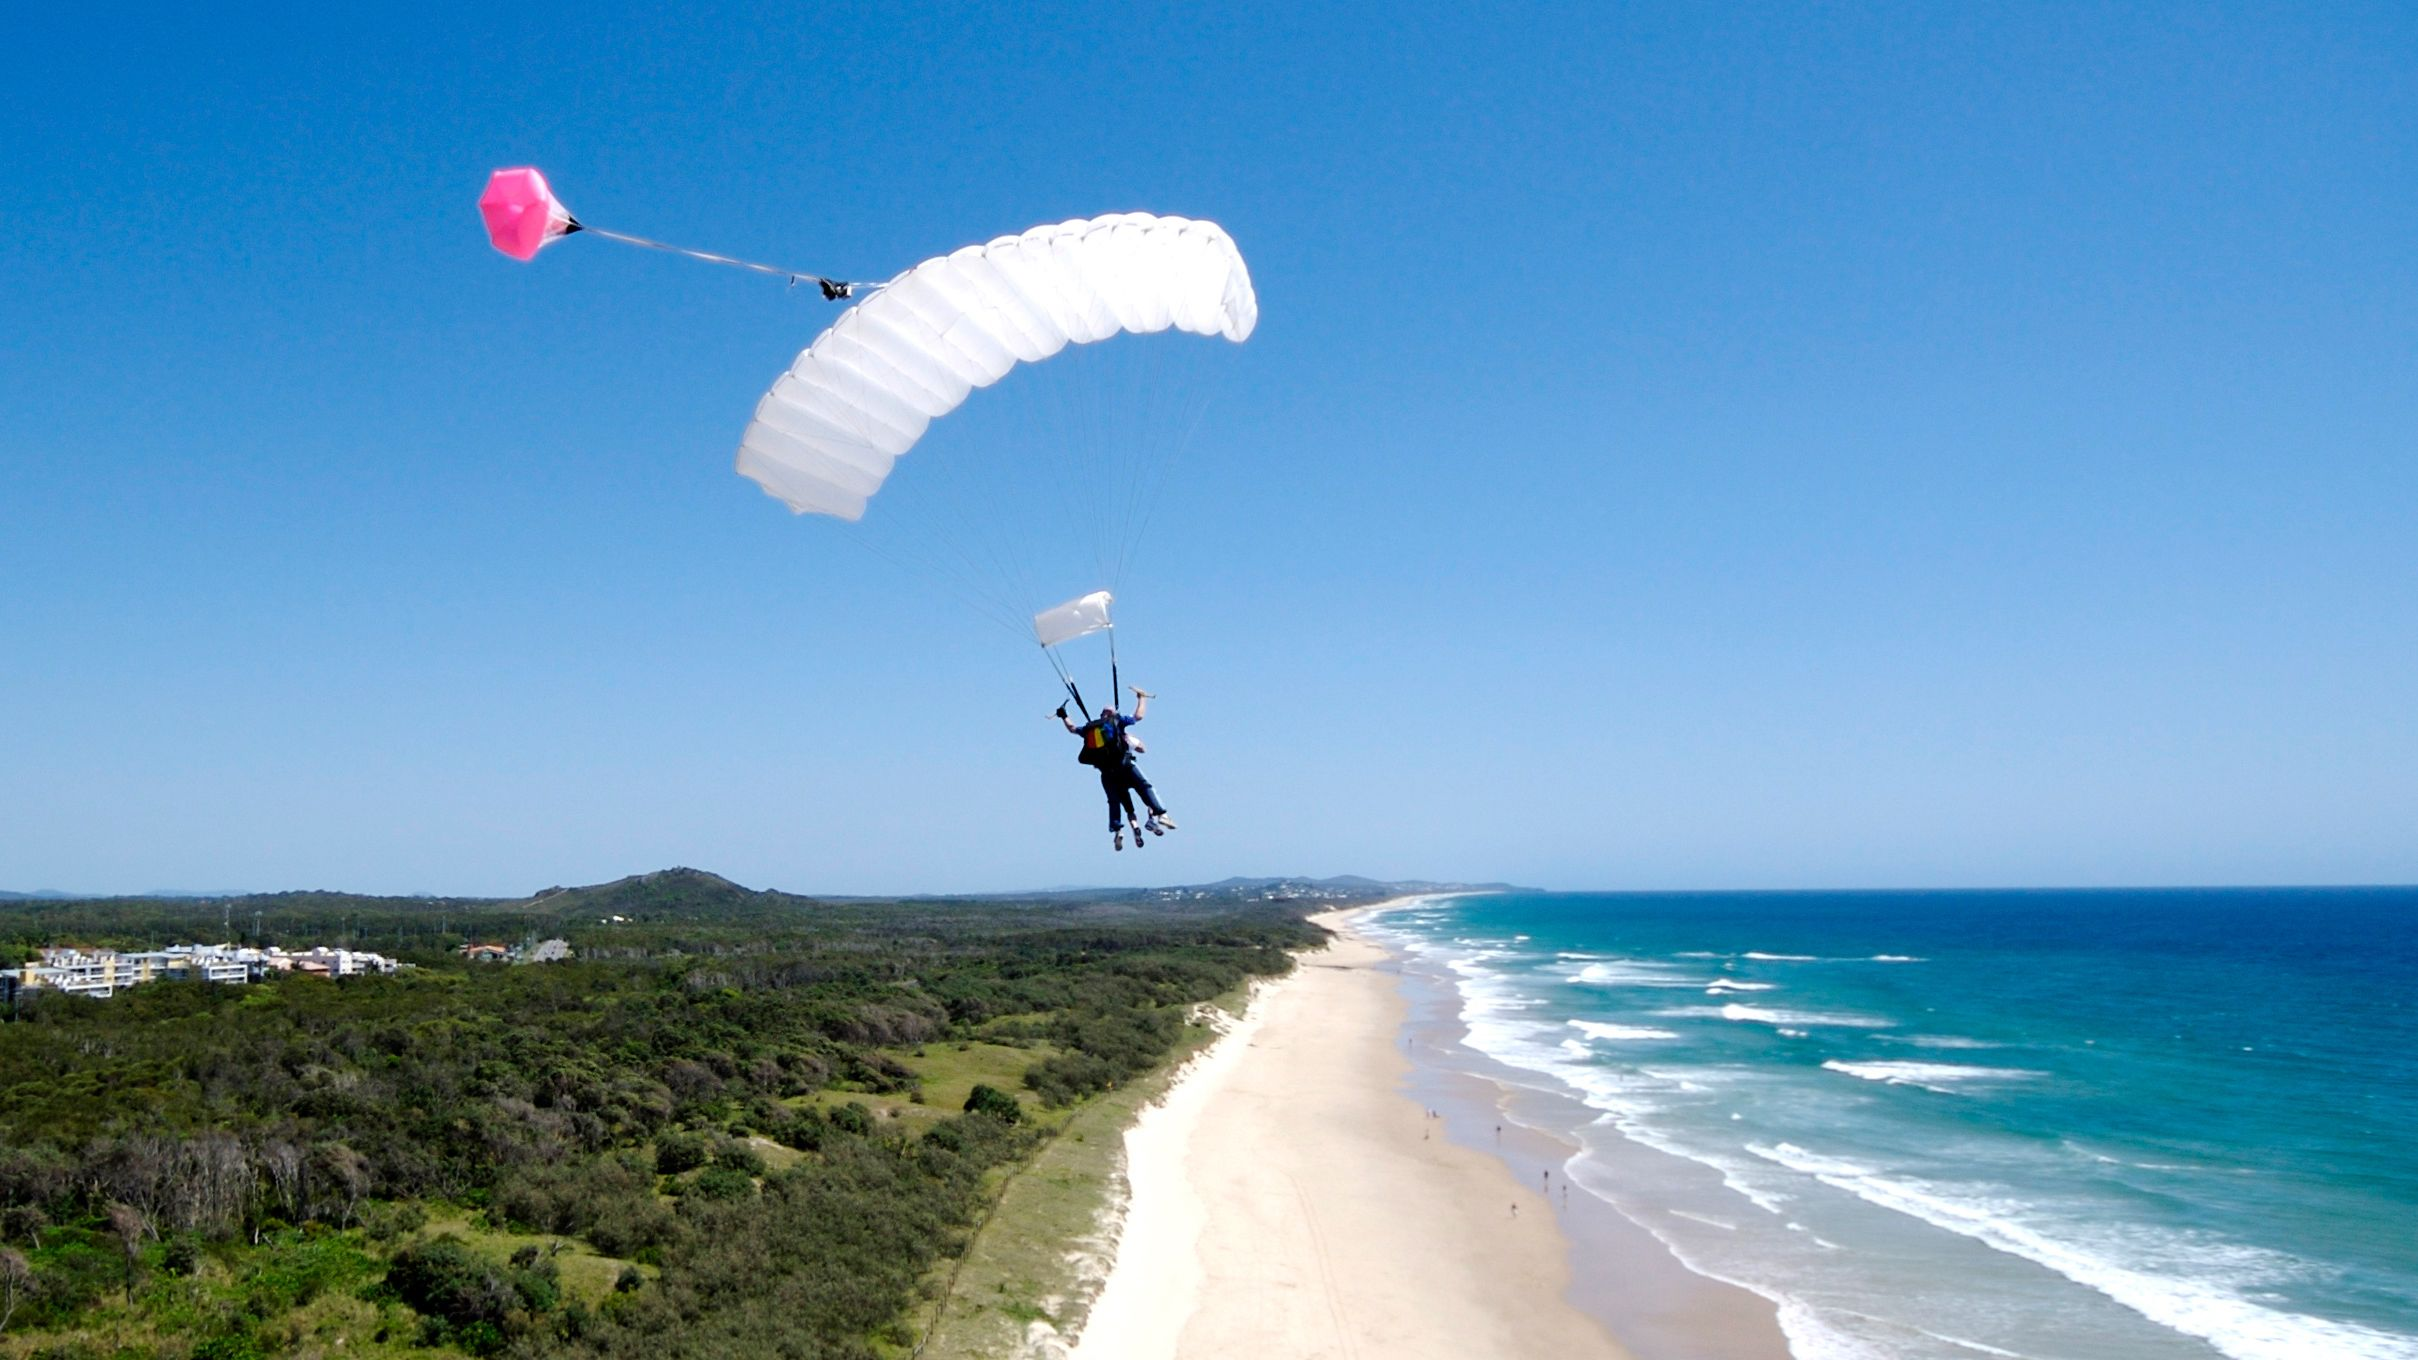 Skydivers with parachute open over Sunshine Coast beach, Australia.